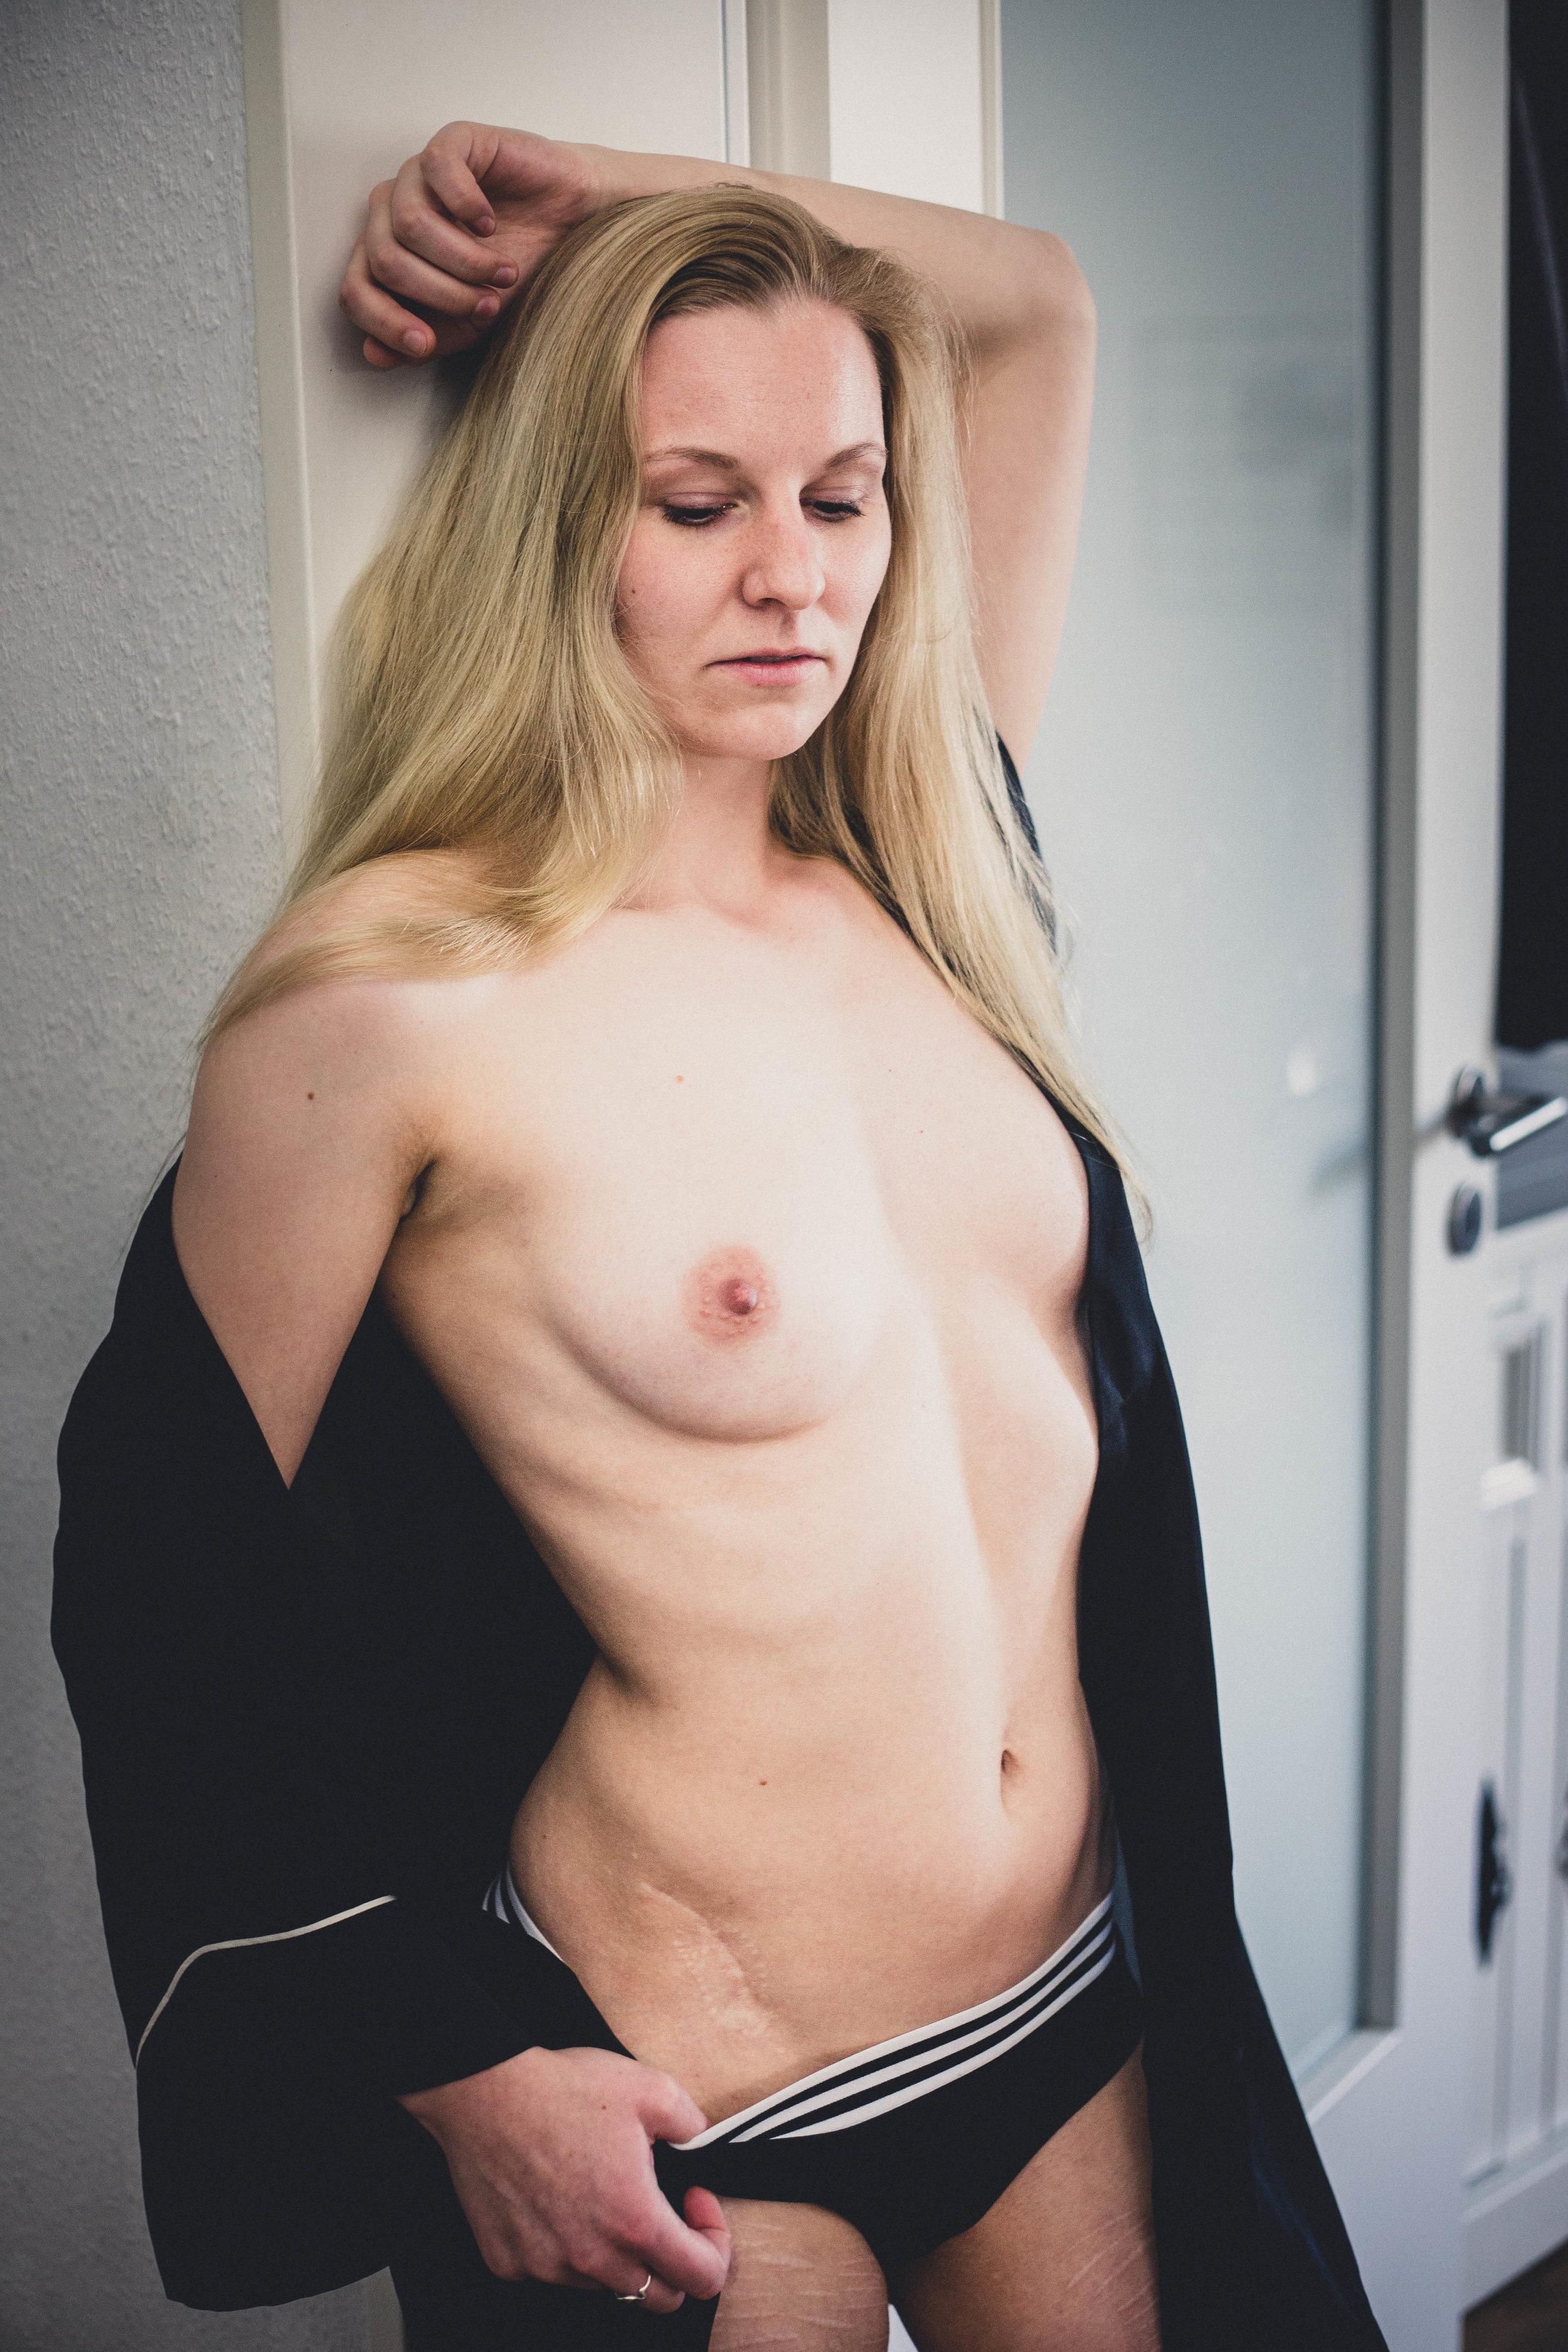 Mama2019-9.jpg